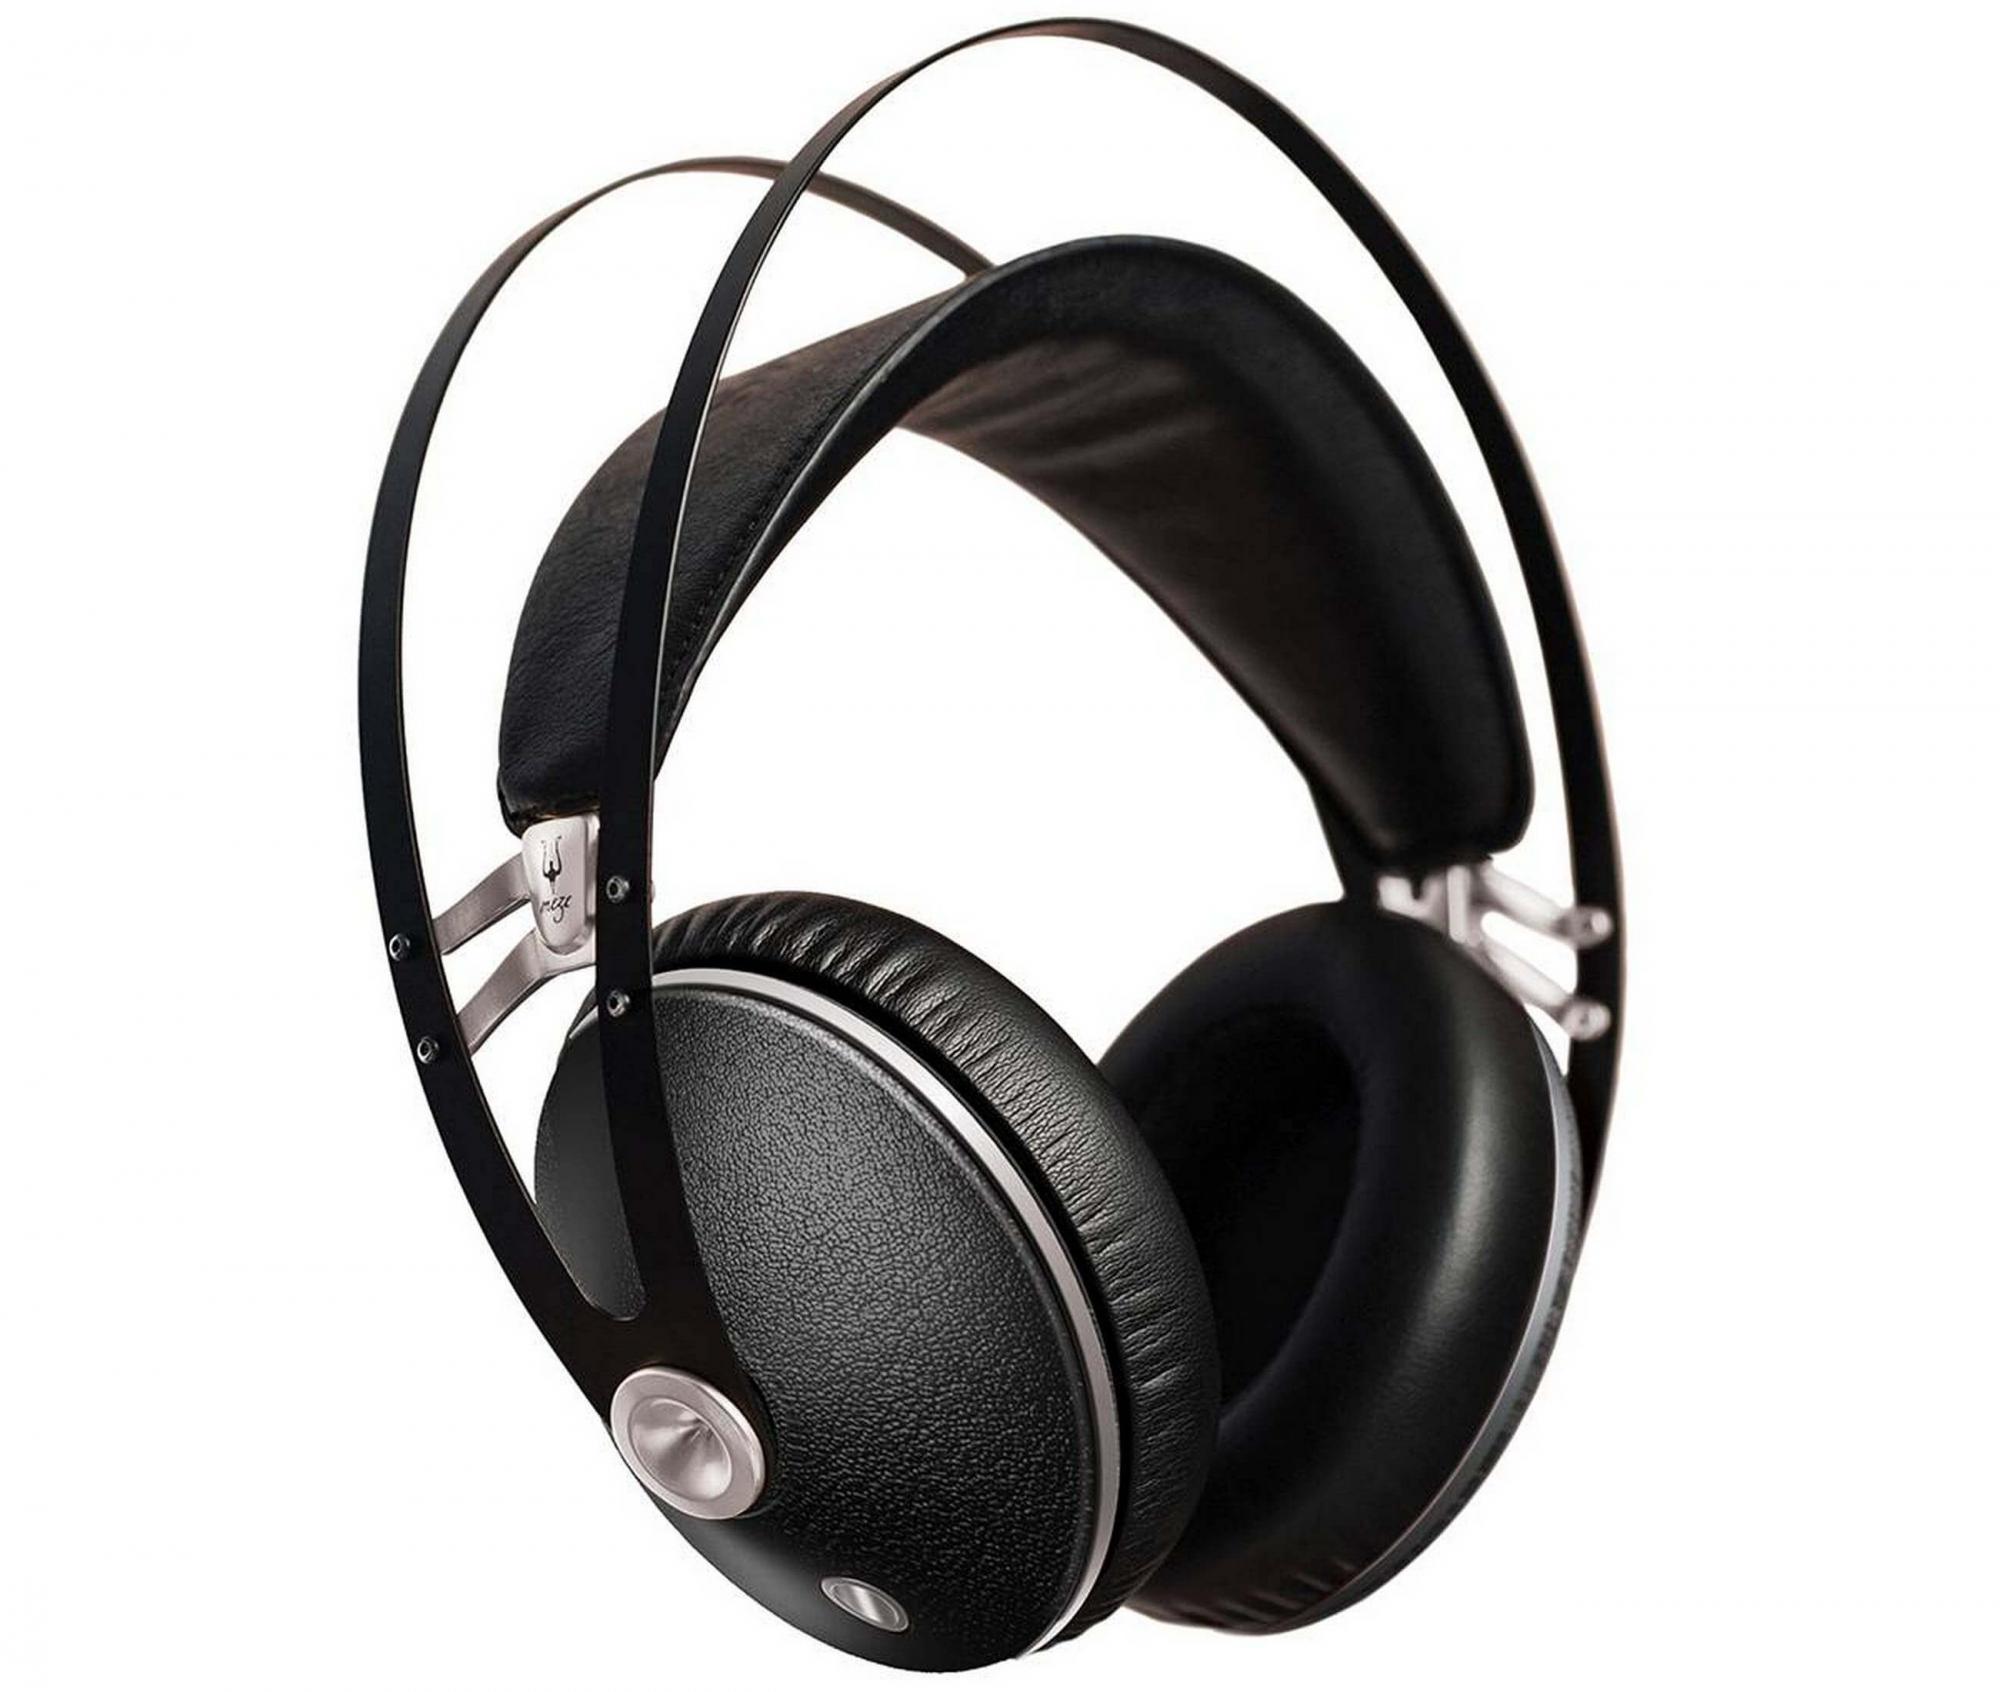 Meze 99 Neo fejhallgató teszt   av online.hu